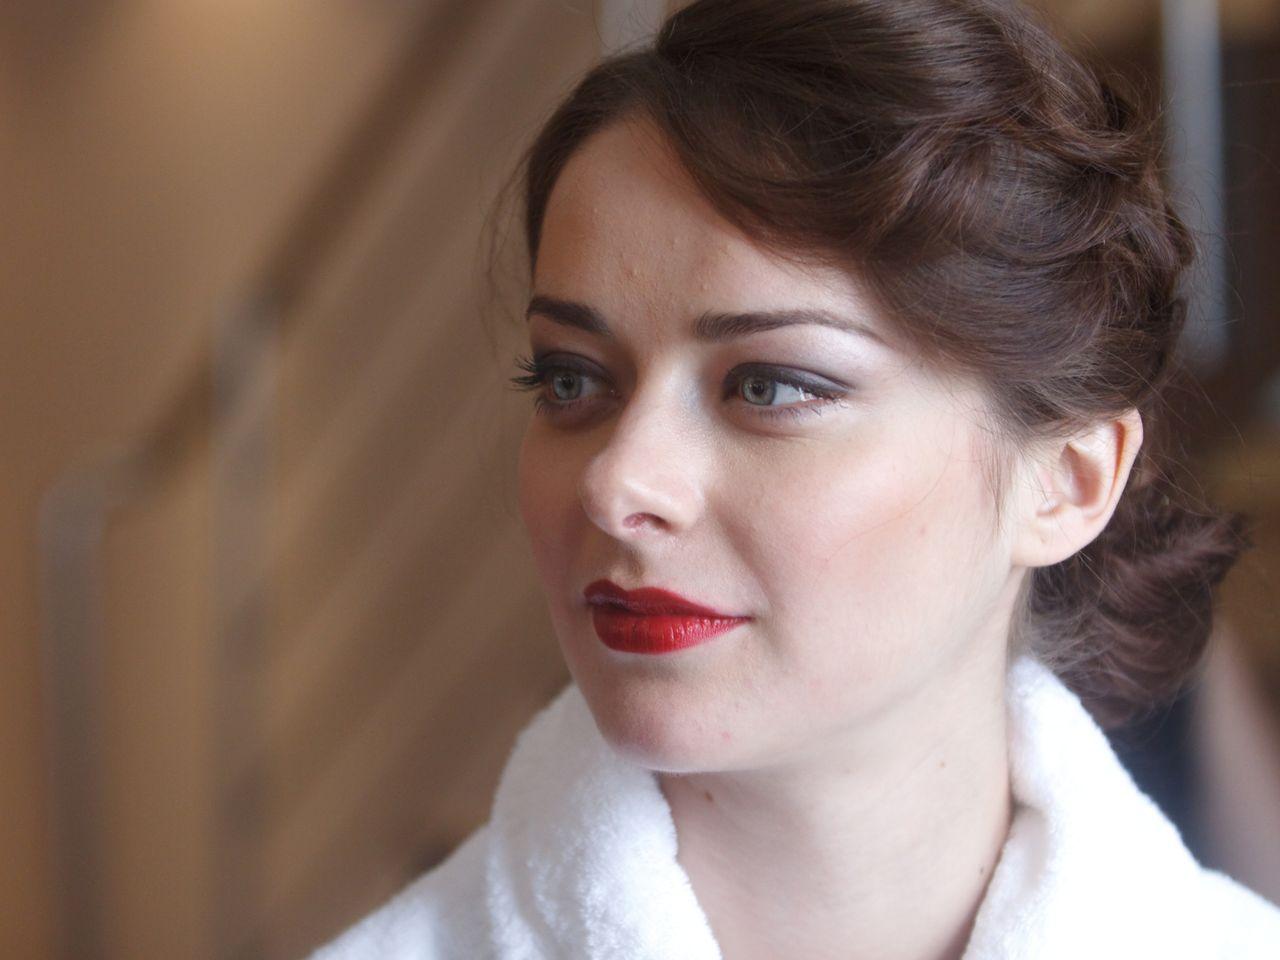 Марину Александрову не узнали фанаты